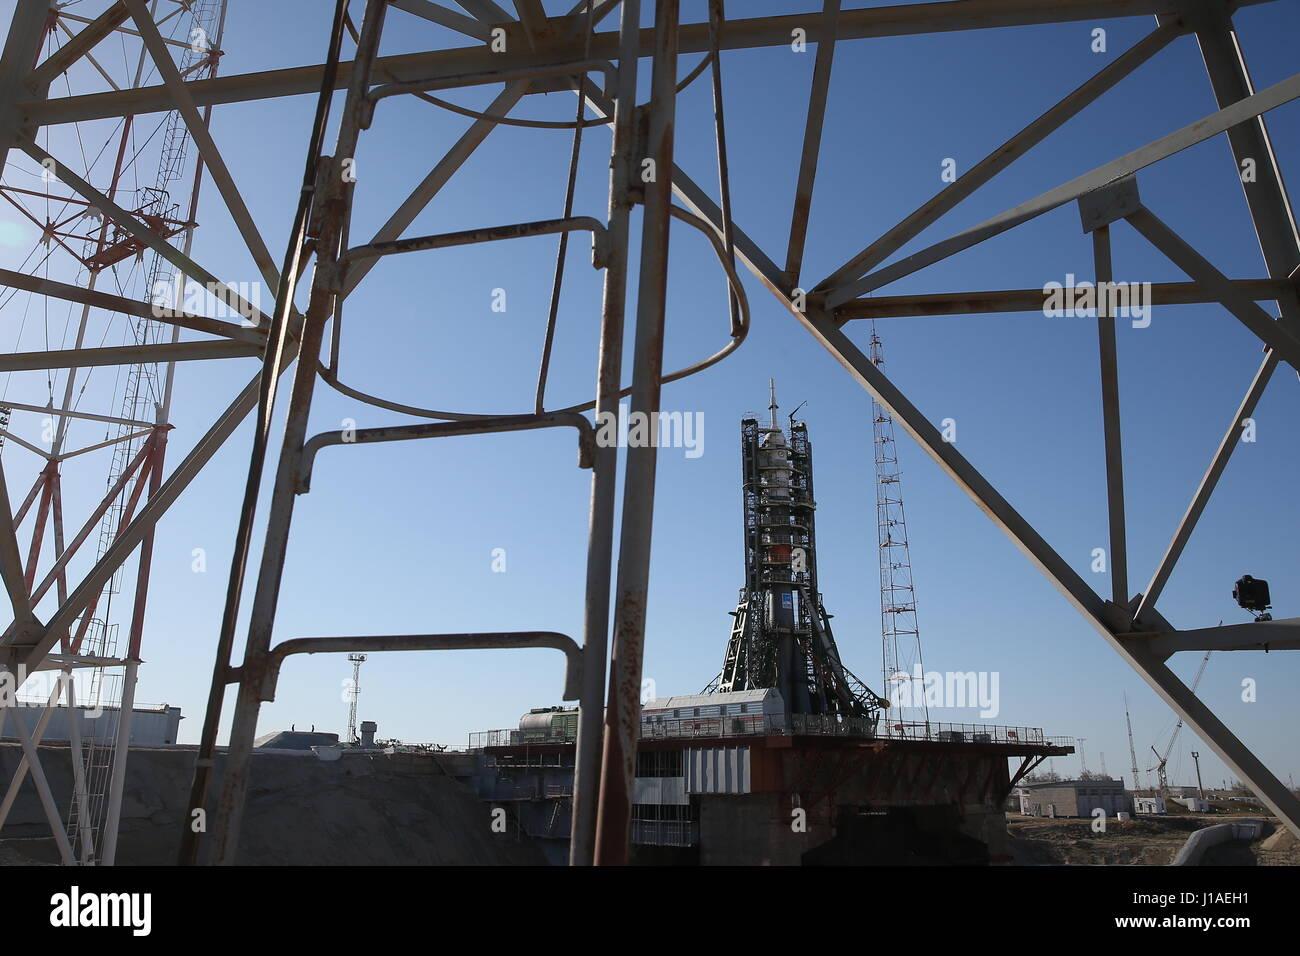 KYZYLORDA REGION, KAZAKHSTAN - APRIL 19, 2017: A view of a Soyuz-FG rocket carrying the Soyuz MS-04 spacecraft, - Stock Image